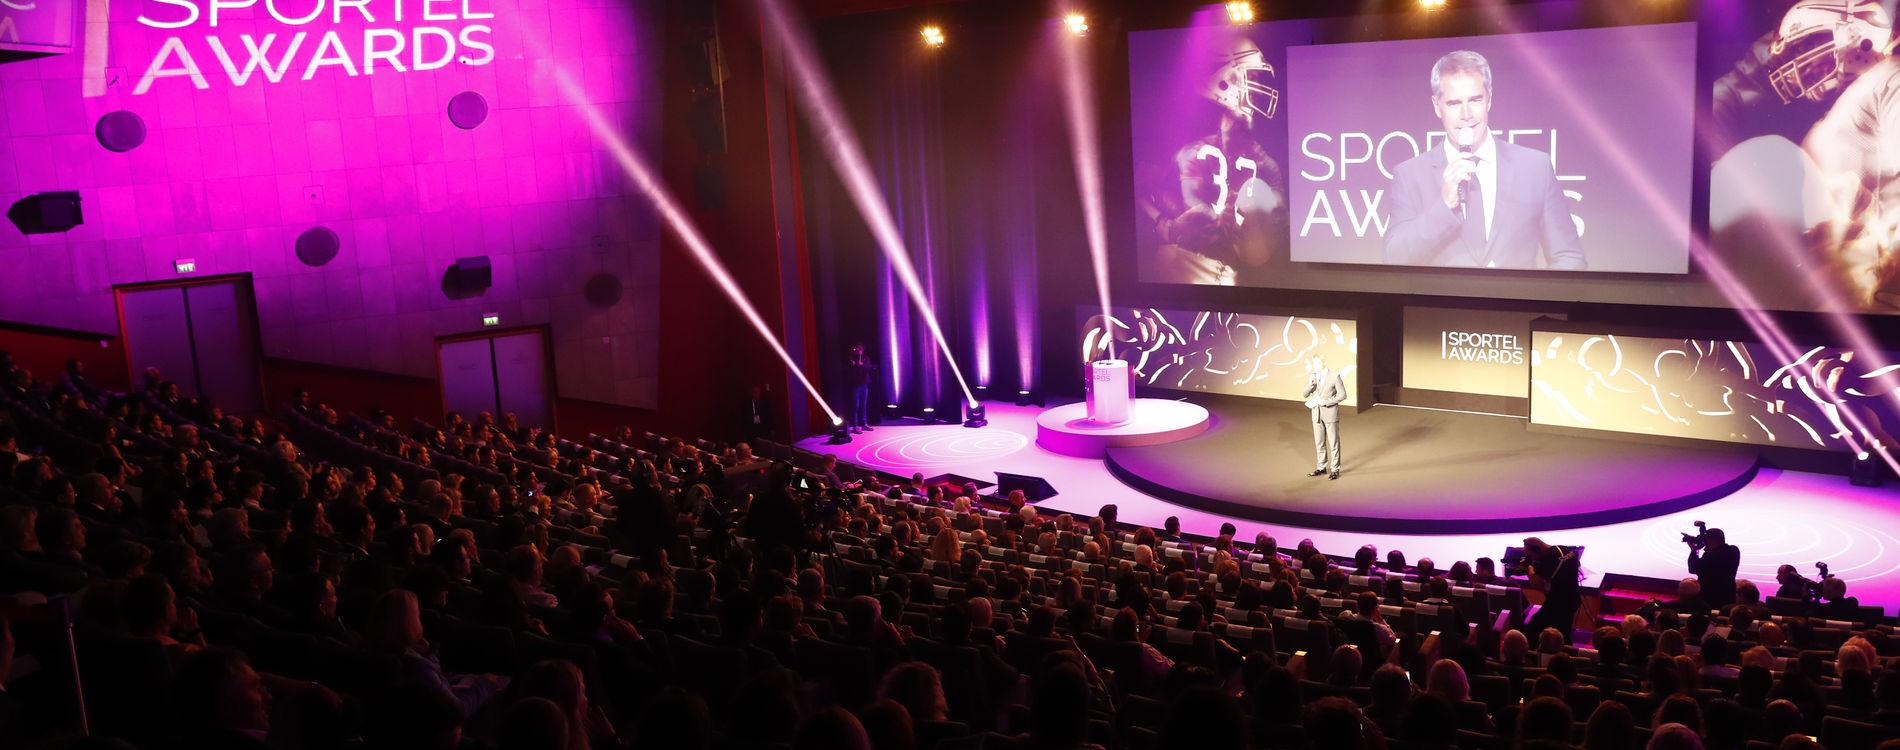 Monaco-Evènement-Spécial-Sportel-Awards-Monte-Carlo